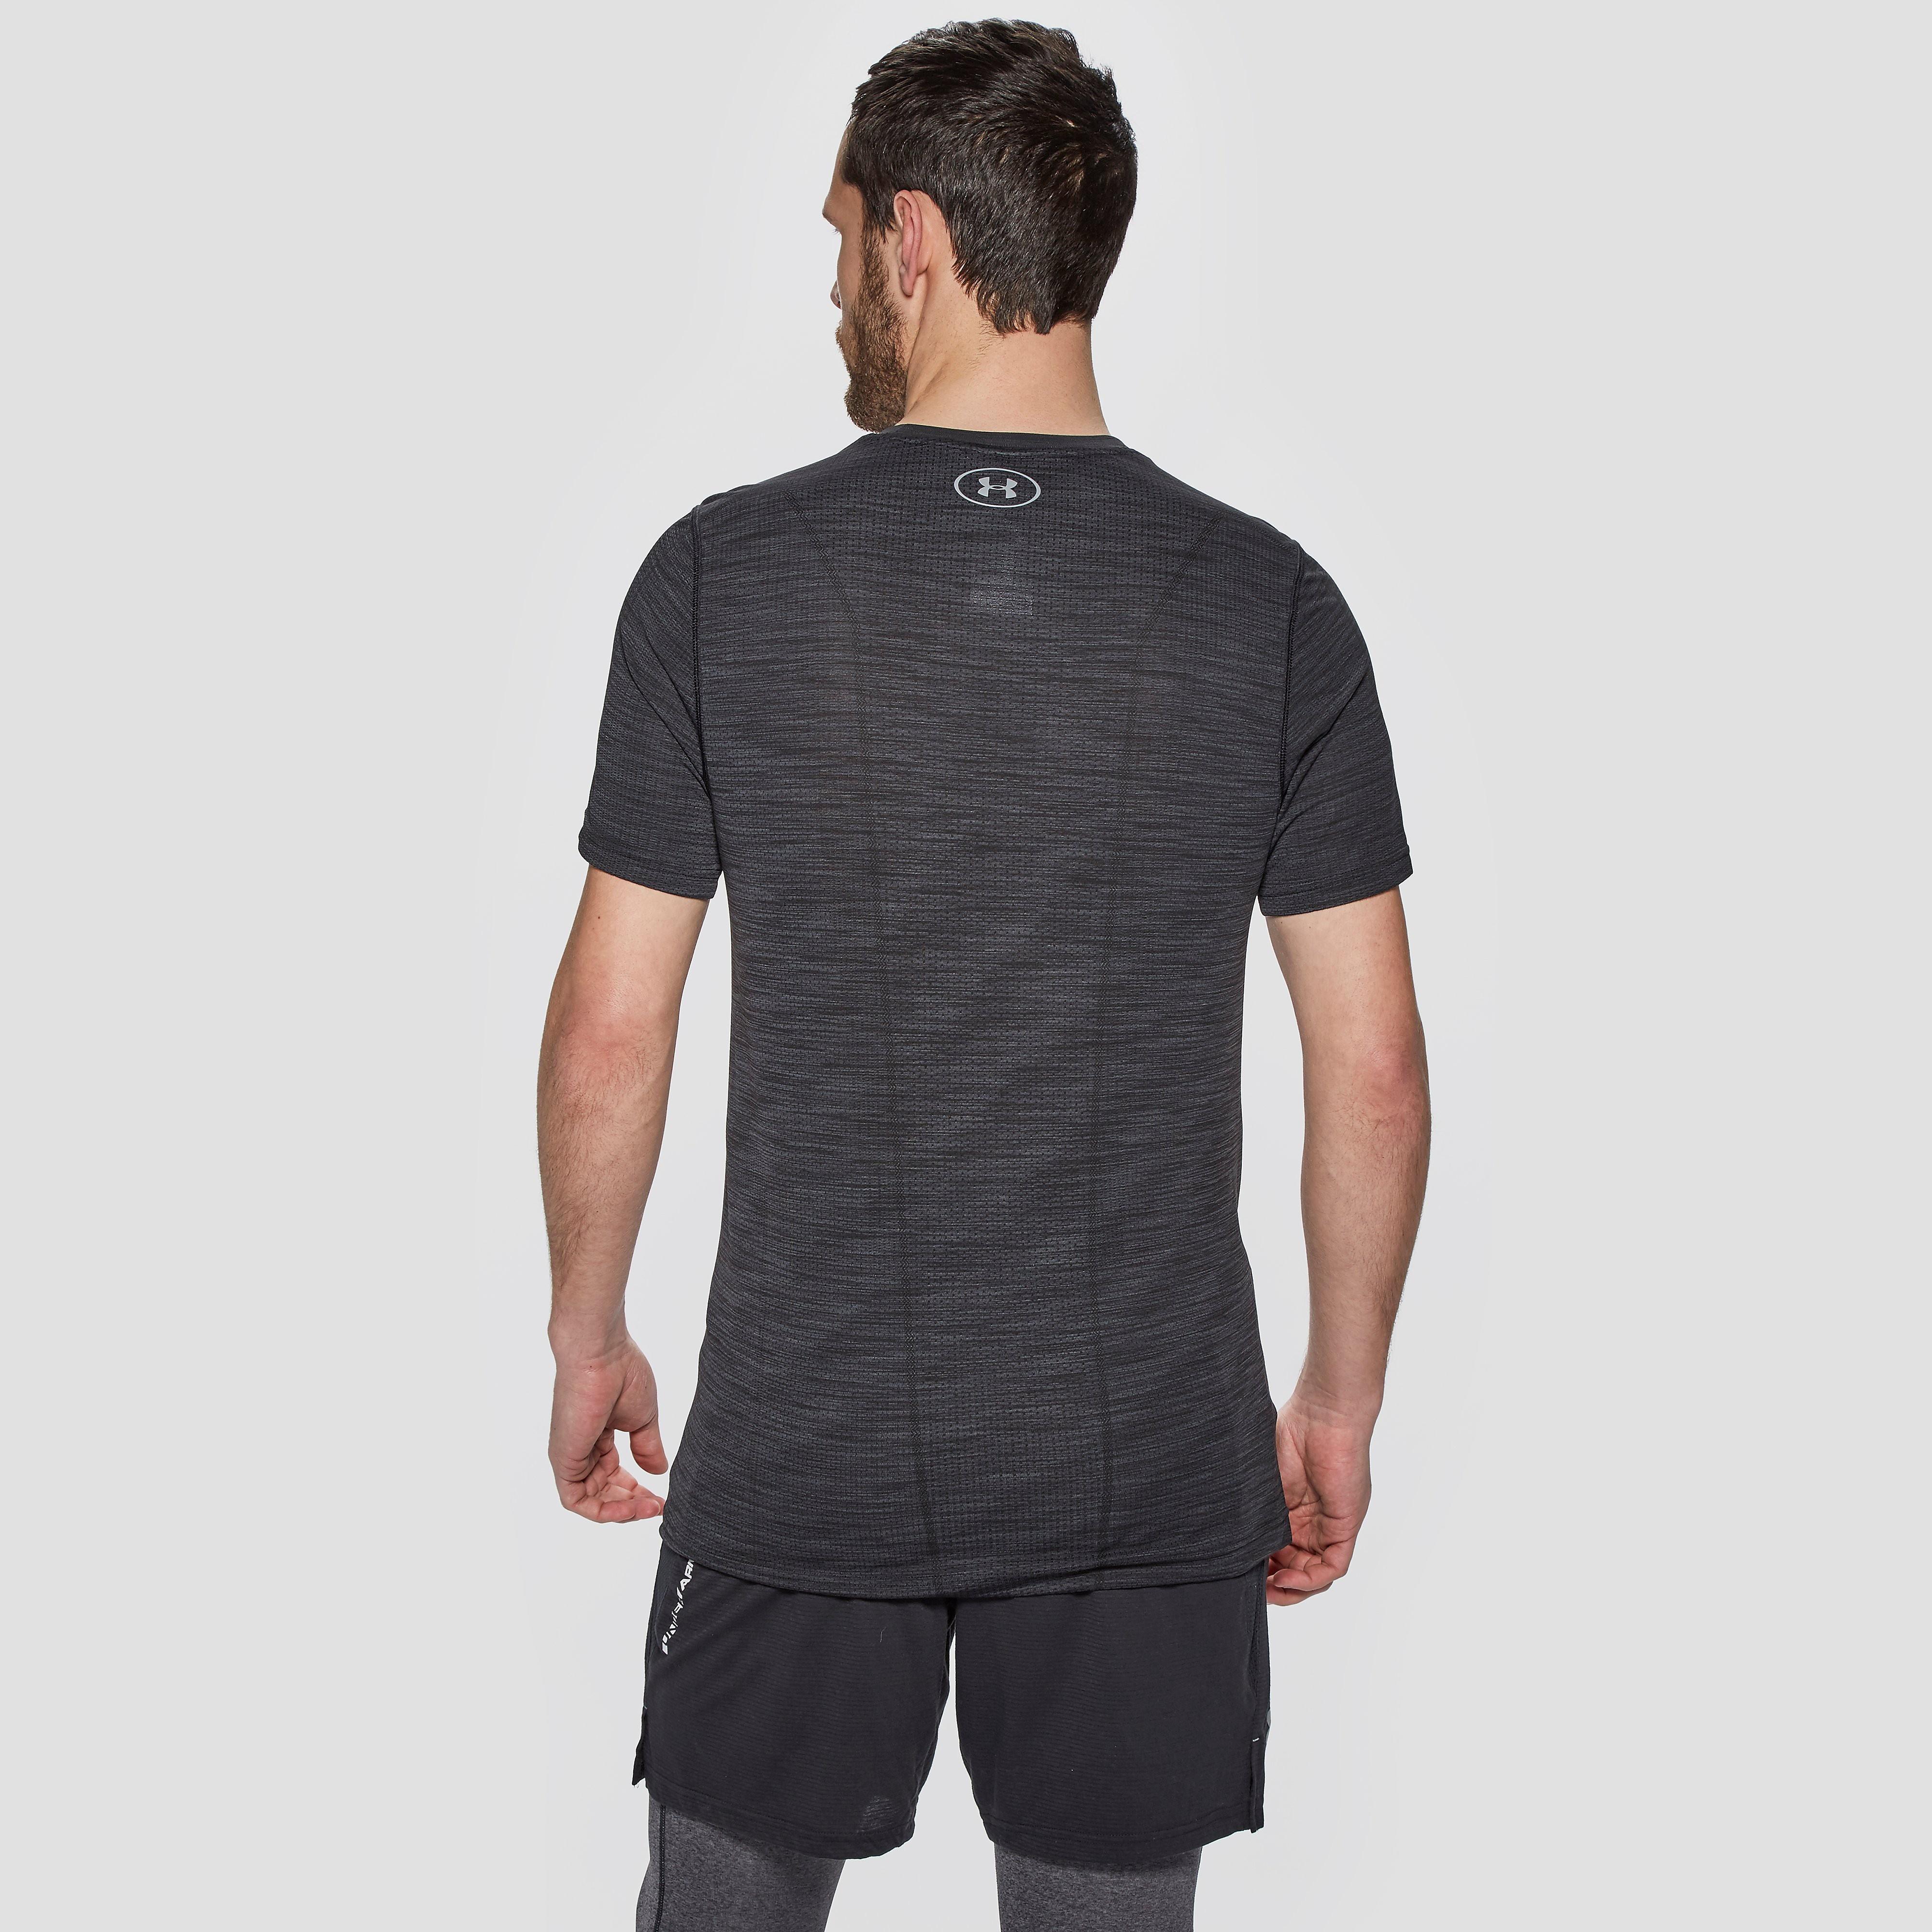 Under Armour Threadborne Streake Run Short Sleeve Men's T-Shirt